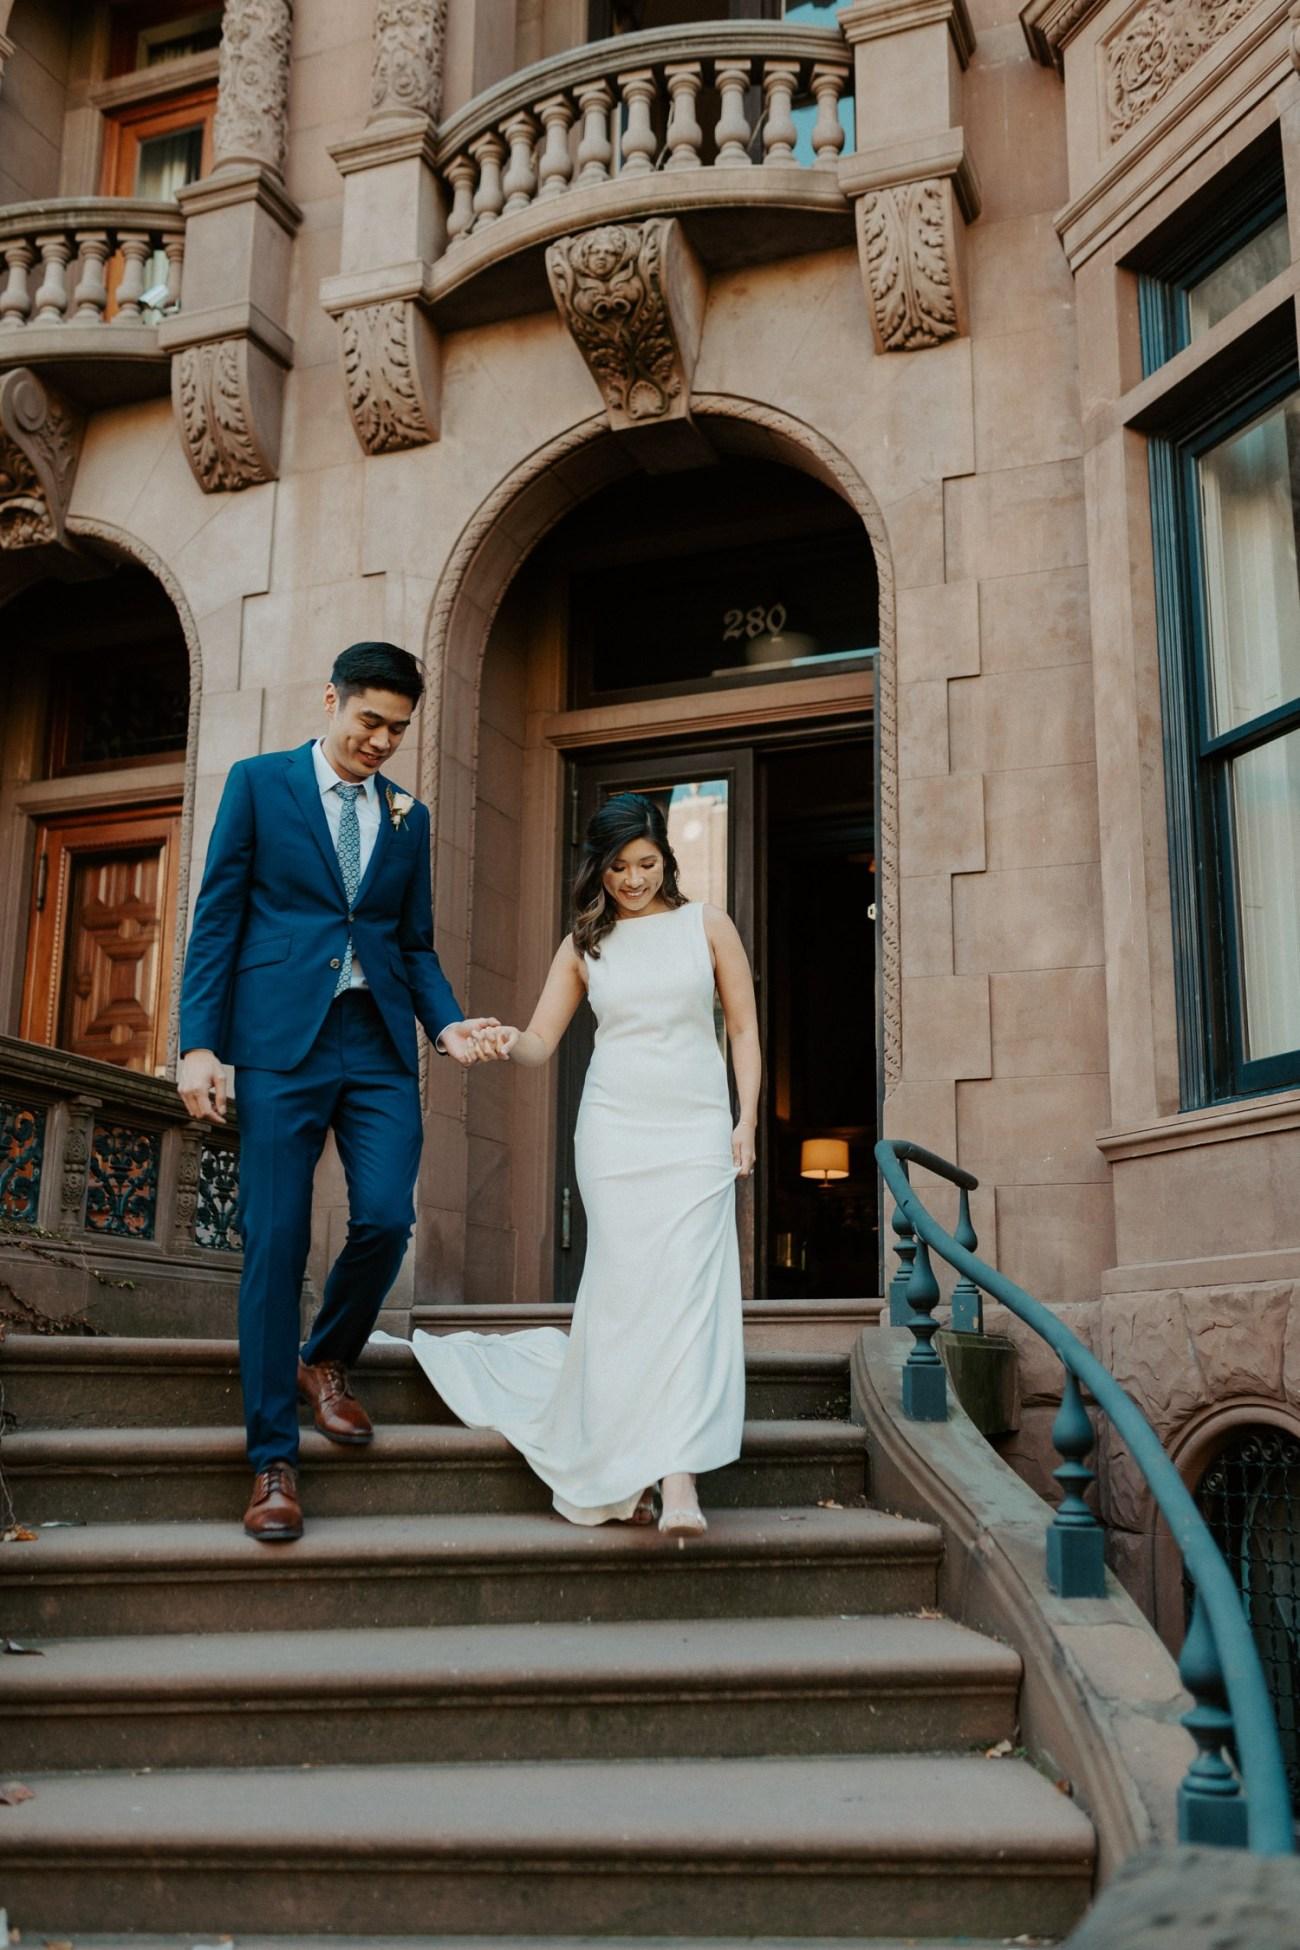 Brooklyn Brownstone House Backyard Wedding New York Wedding Photographer Anais Possamai Photography 15